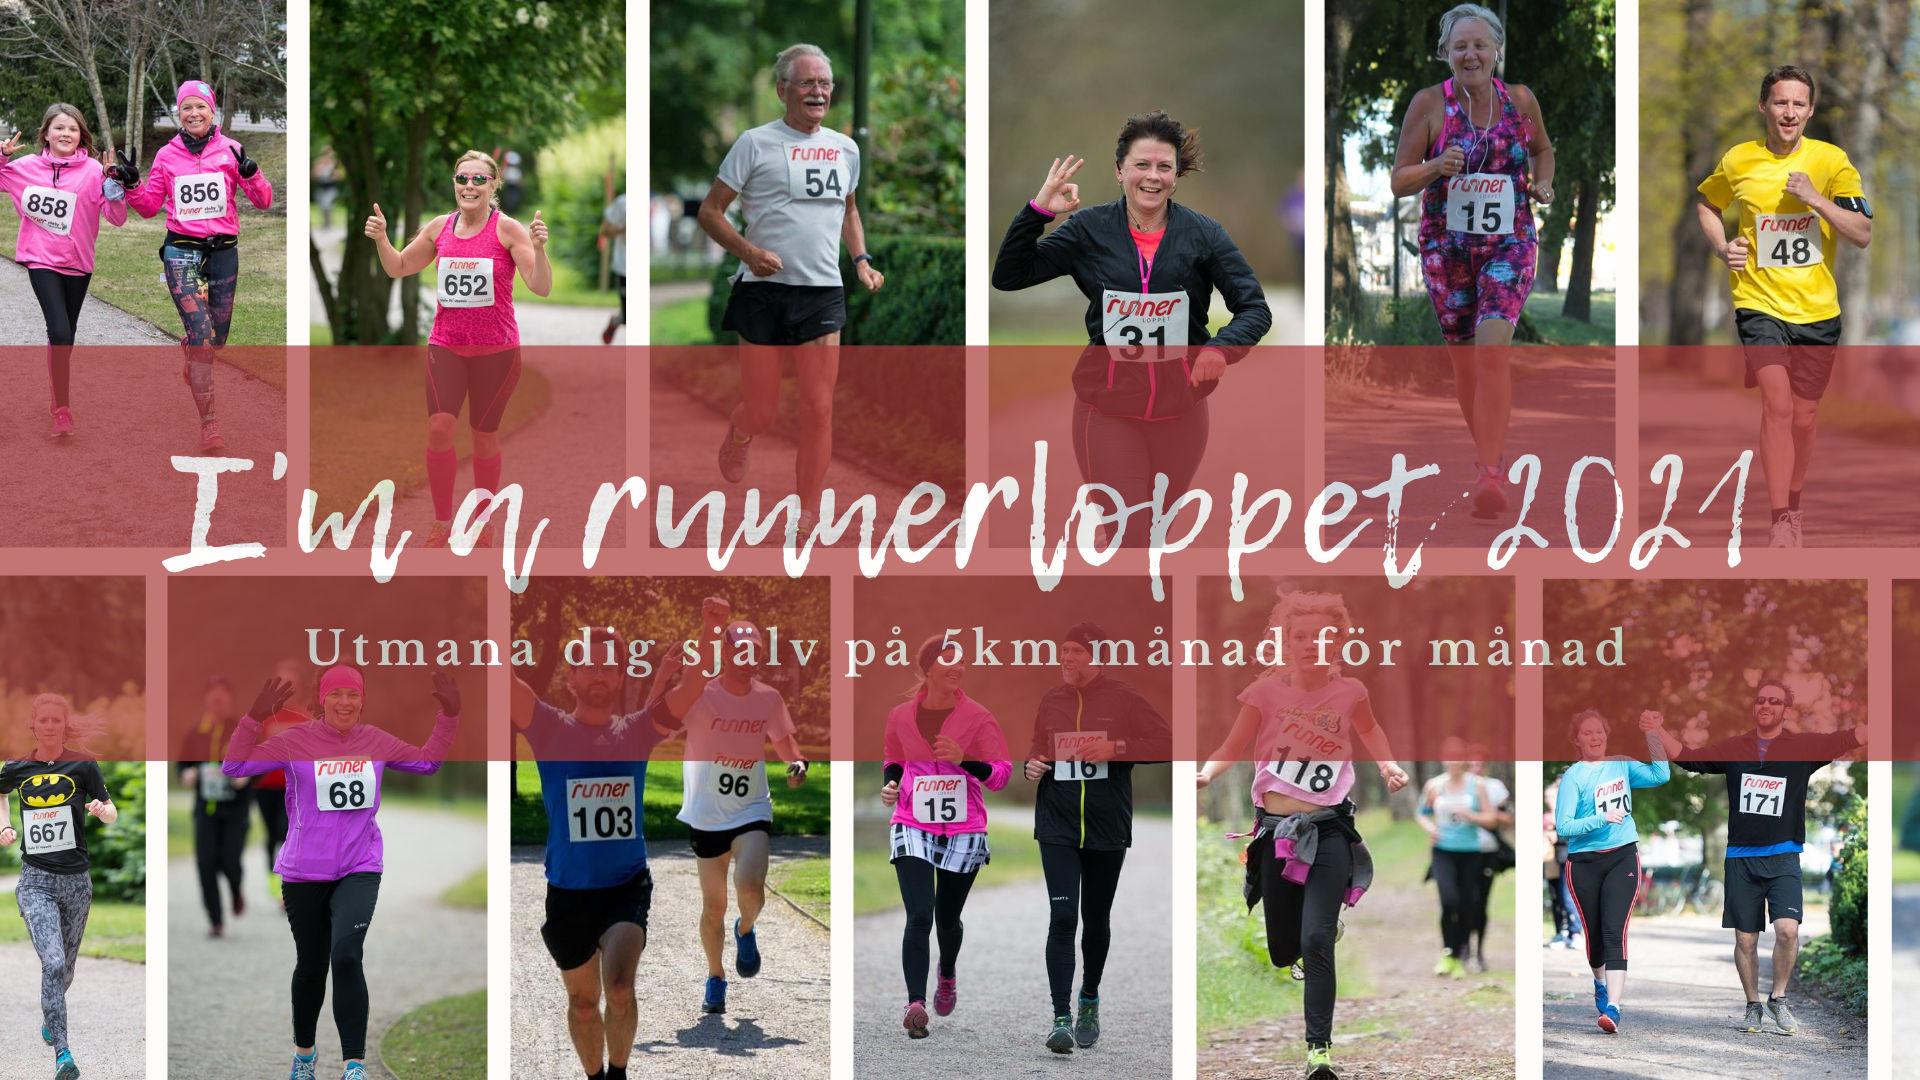 I'm a runnerloppet - Lopp 6 av 6